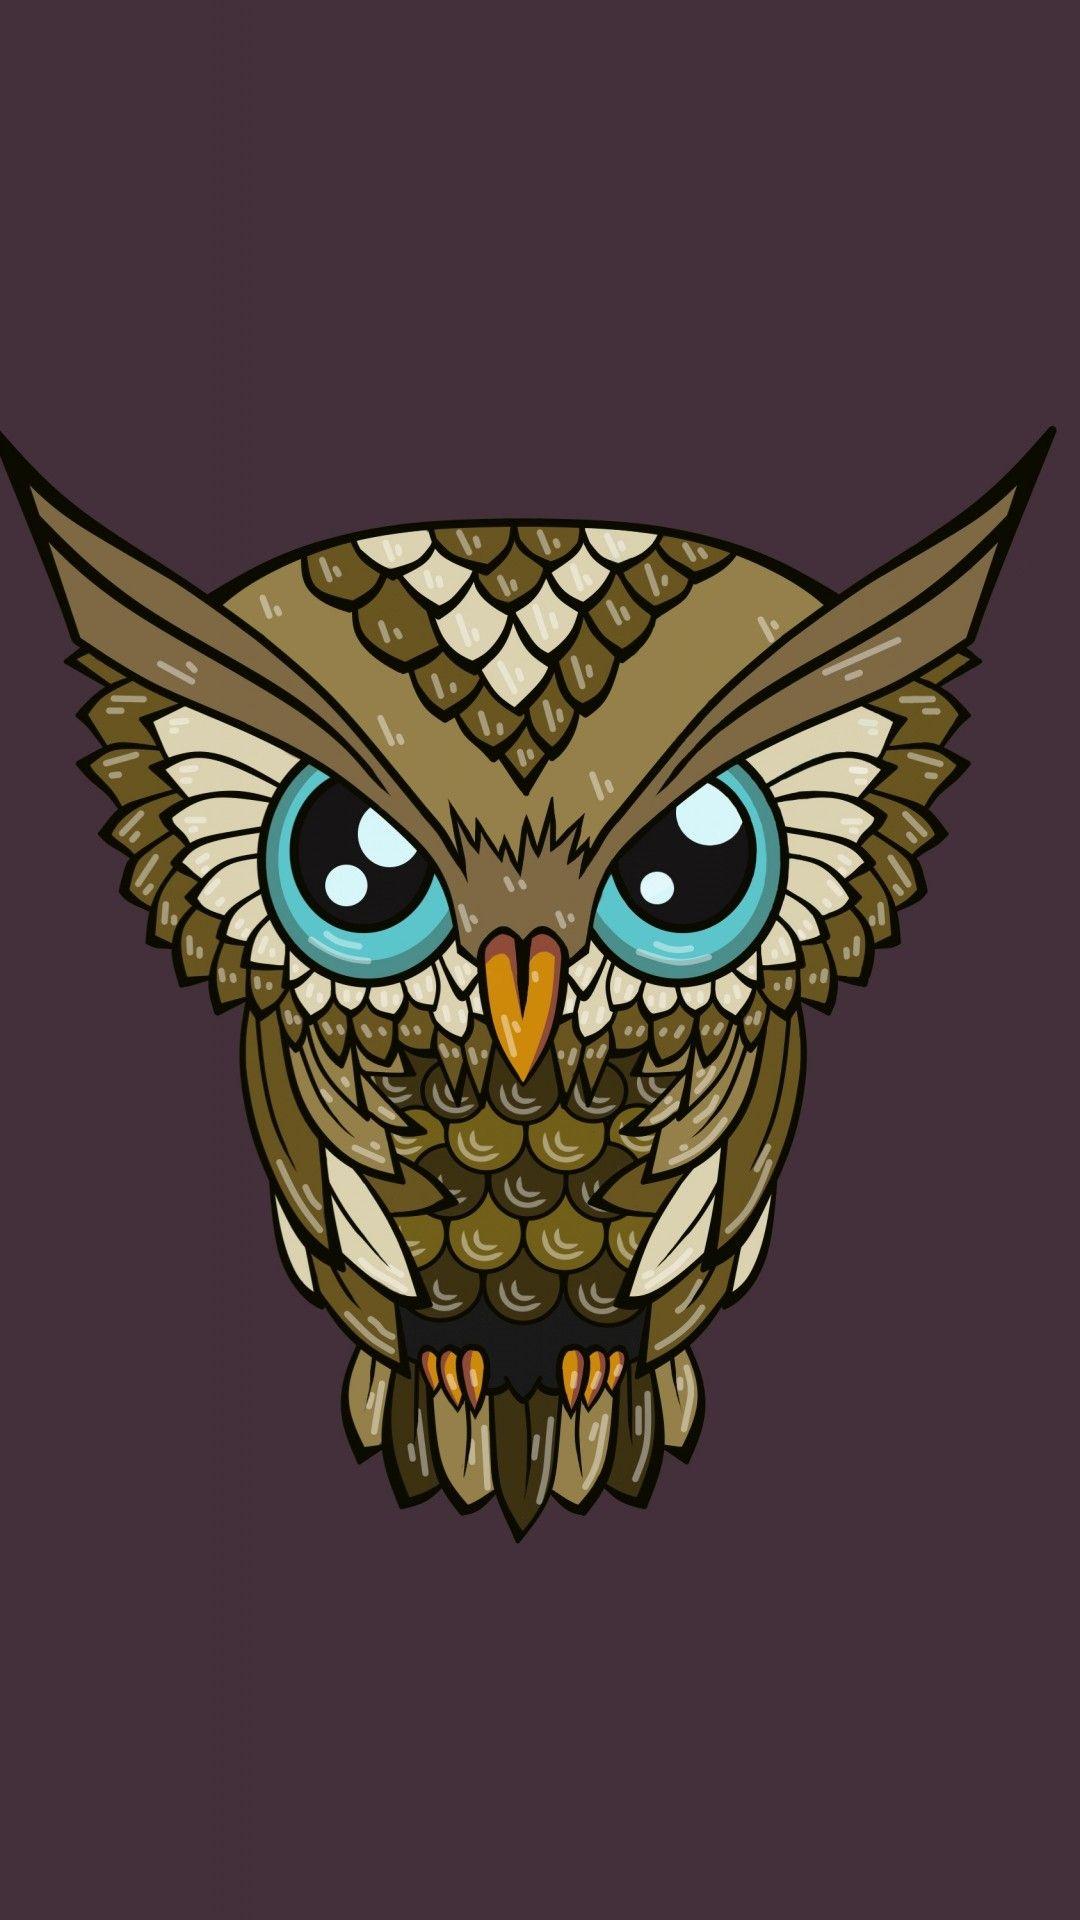 Owl Wallpaper Cute Owls Wallpaper Owl Wallpaper Animal Wallpaper